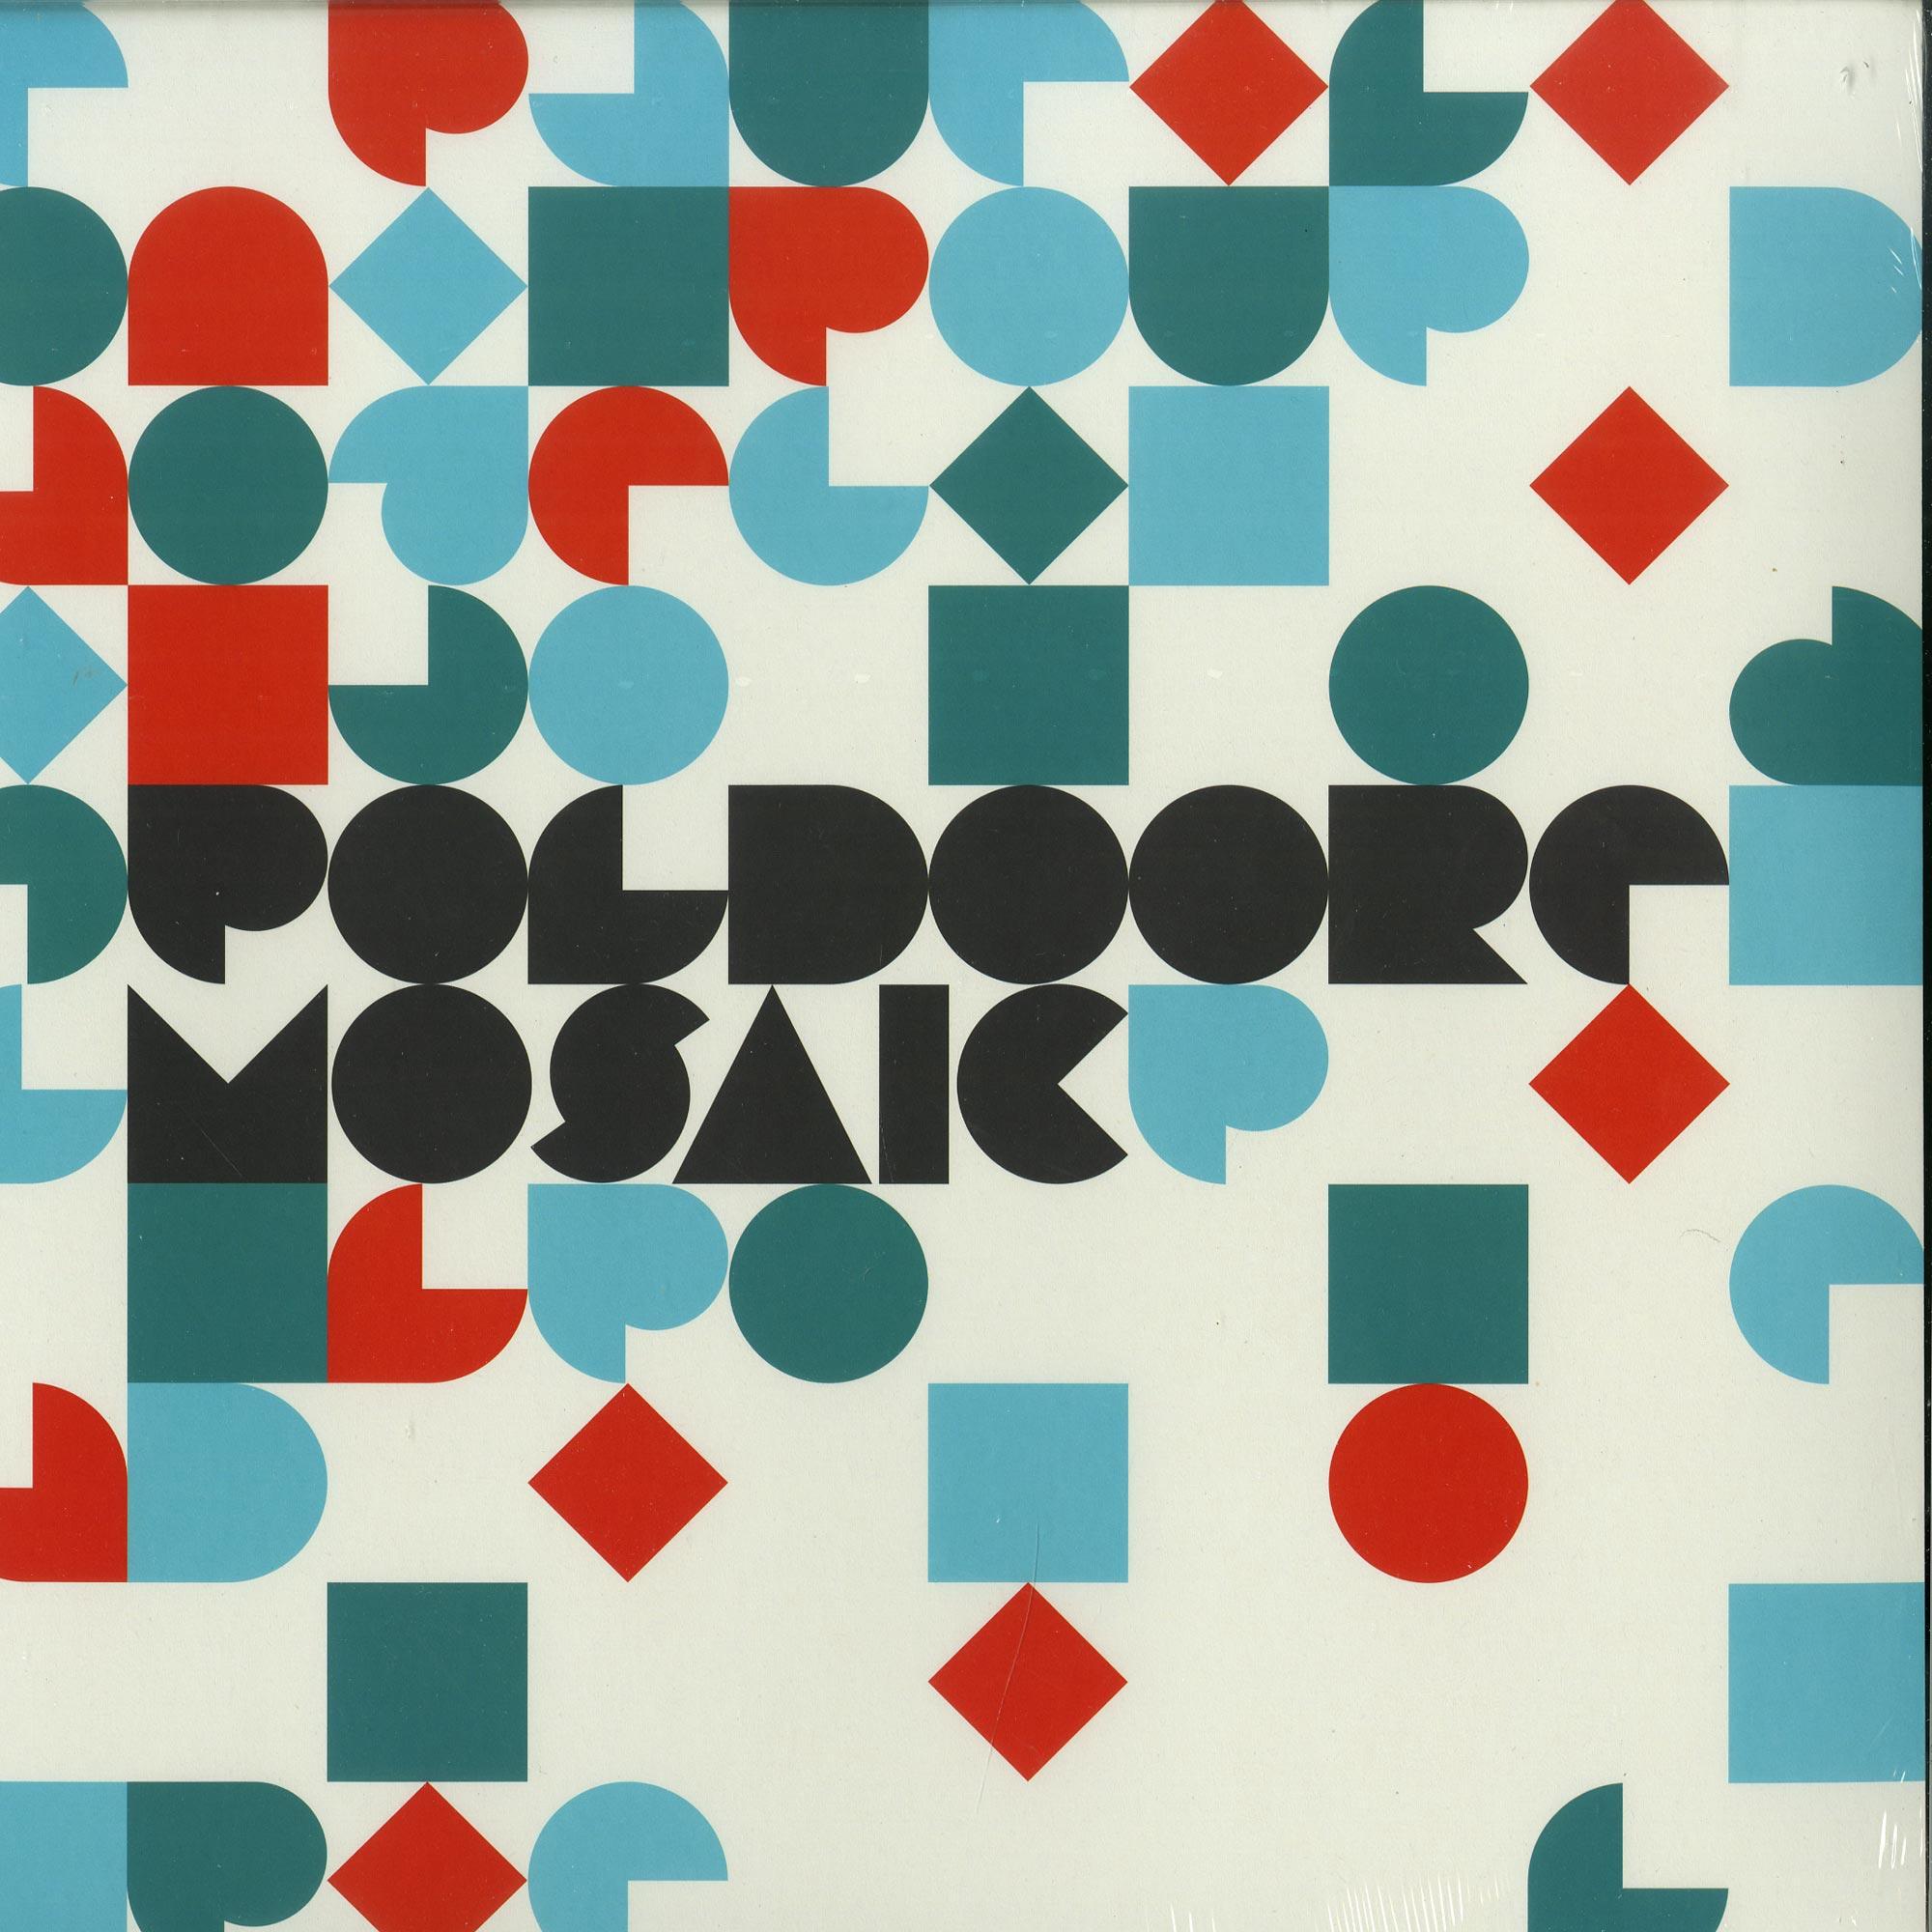 Poldoore - MOASIC